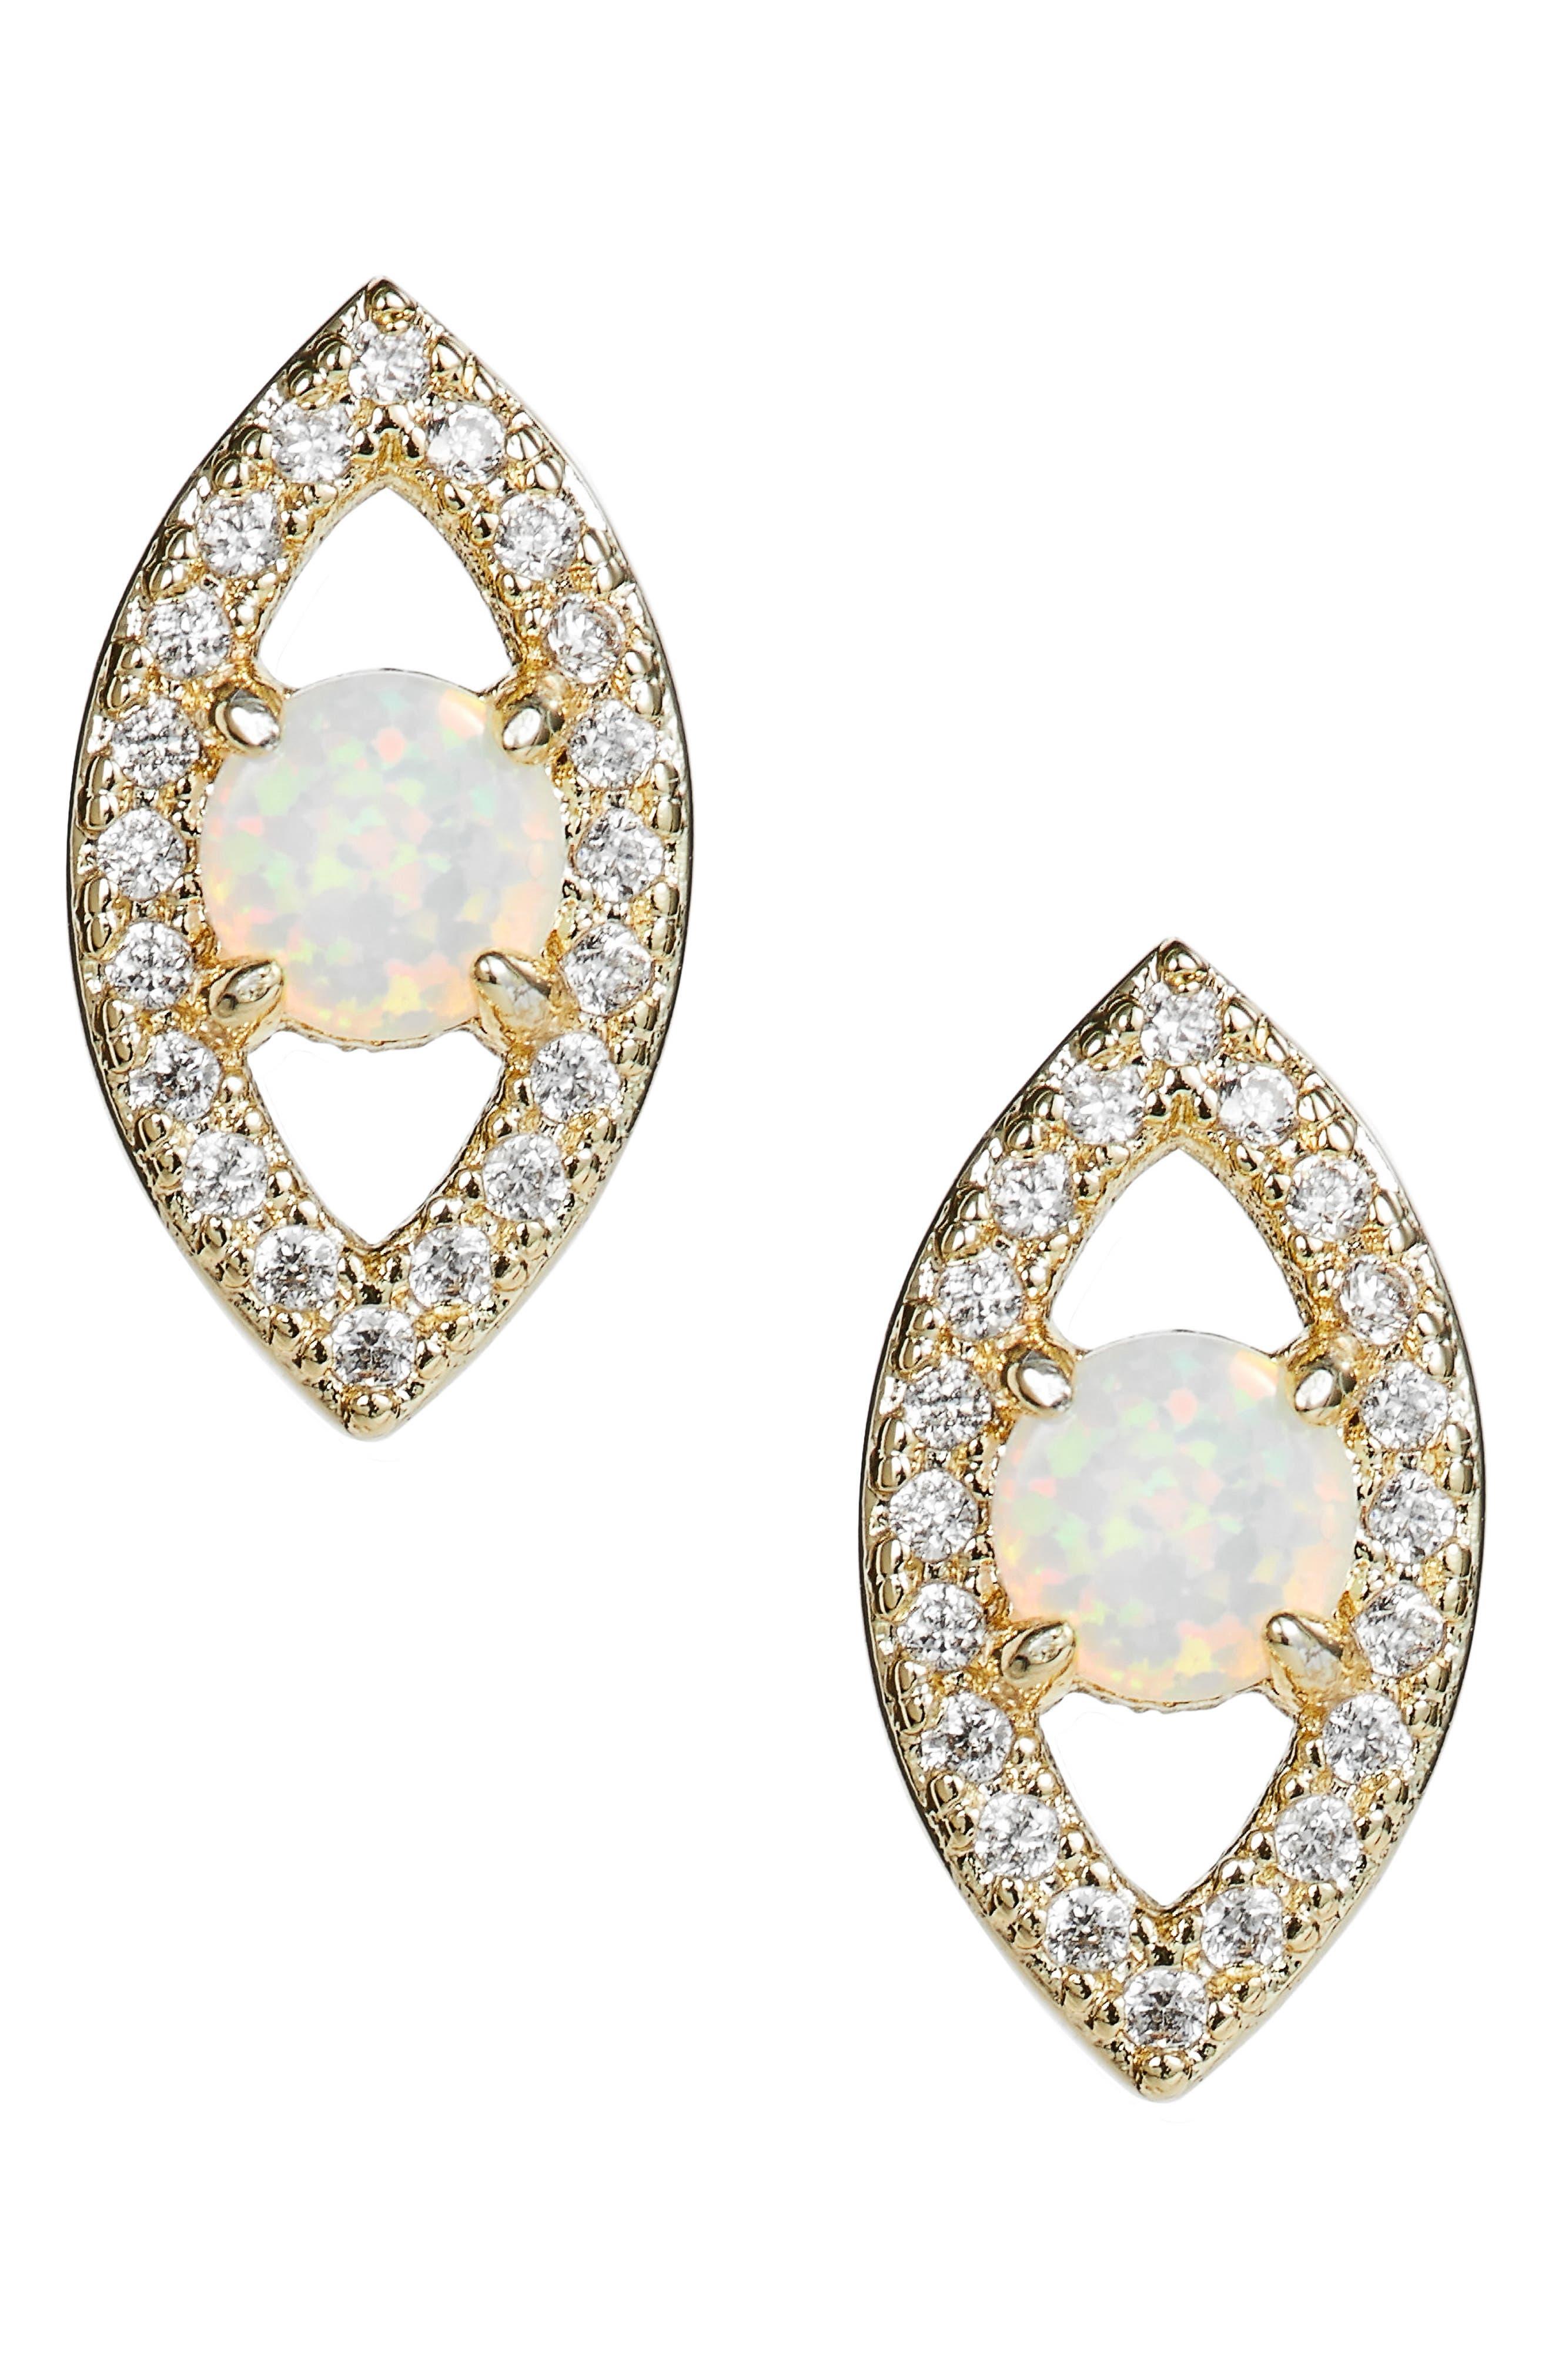 MELINDA MARIA Evil Eye Stud Earrings, Main, color, 710